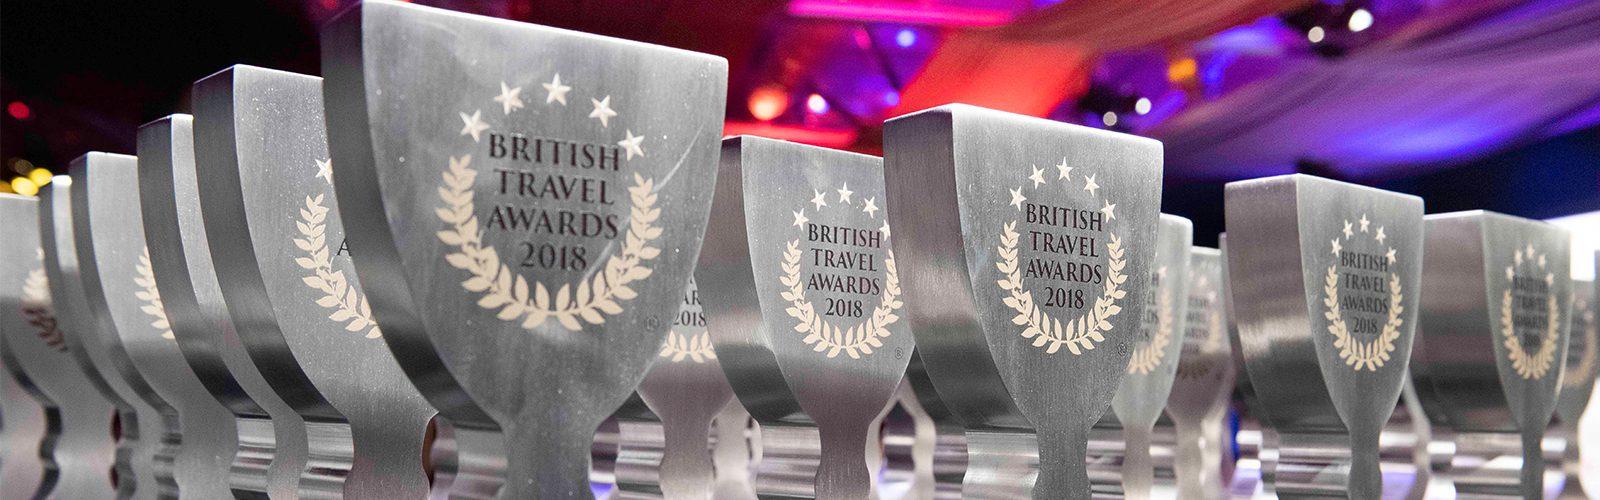 British Travel Awards 2018 Award Winning Travel Agency In Birmingham Header